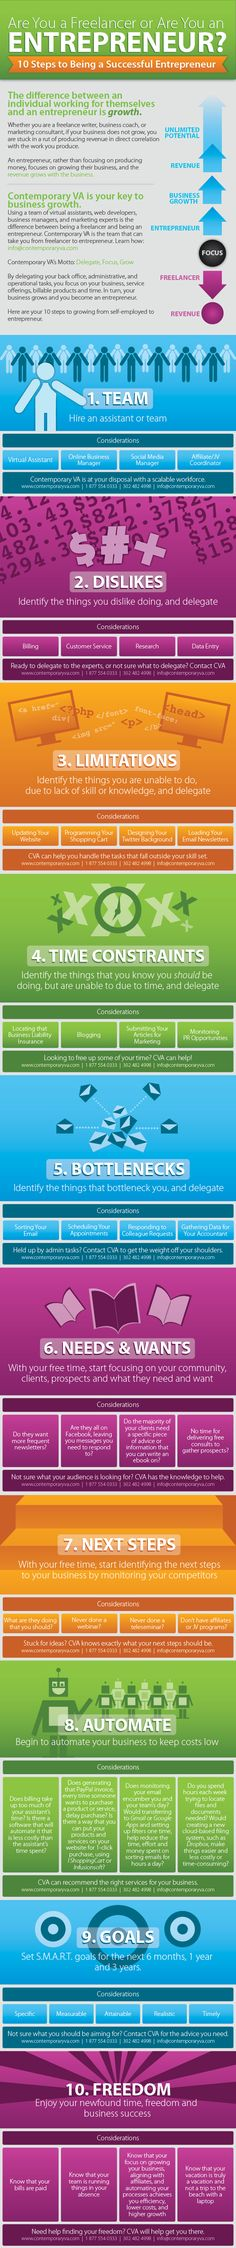 Entrepreneurial Qualities 10 #Entrepreneurial Qualities that Lead to #Success www.sourcepep.com/80-20-blog/